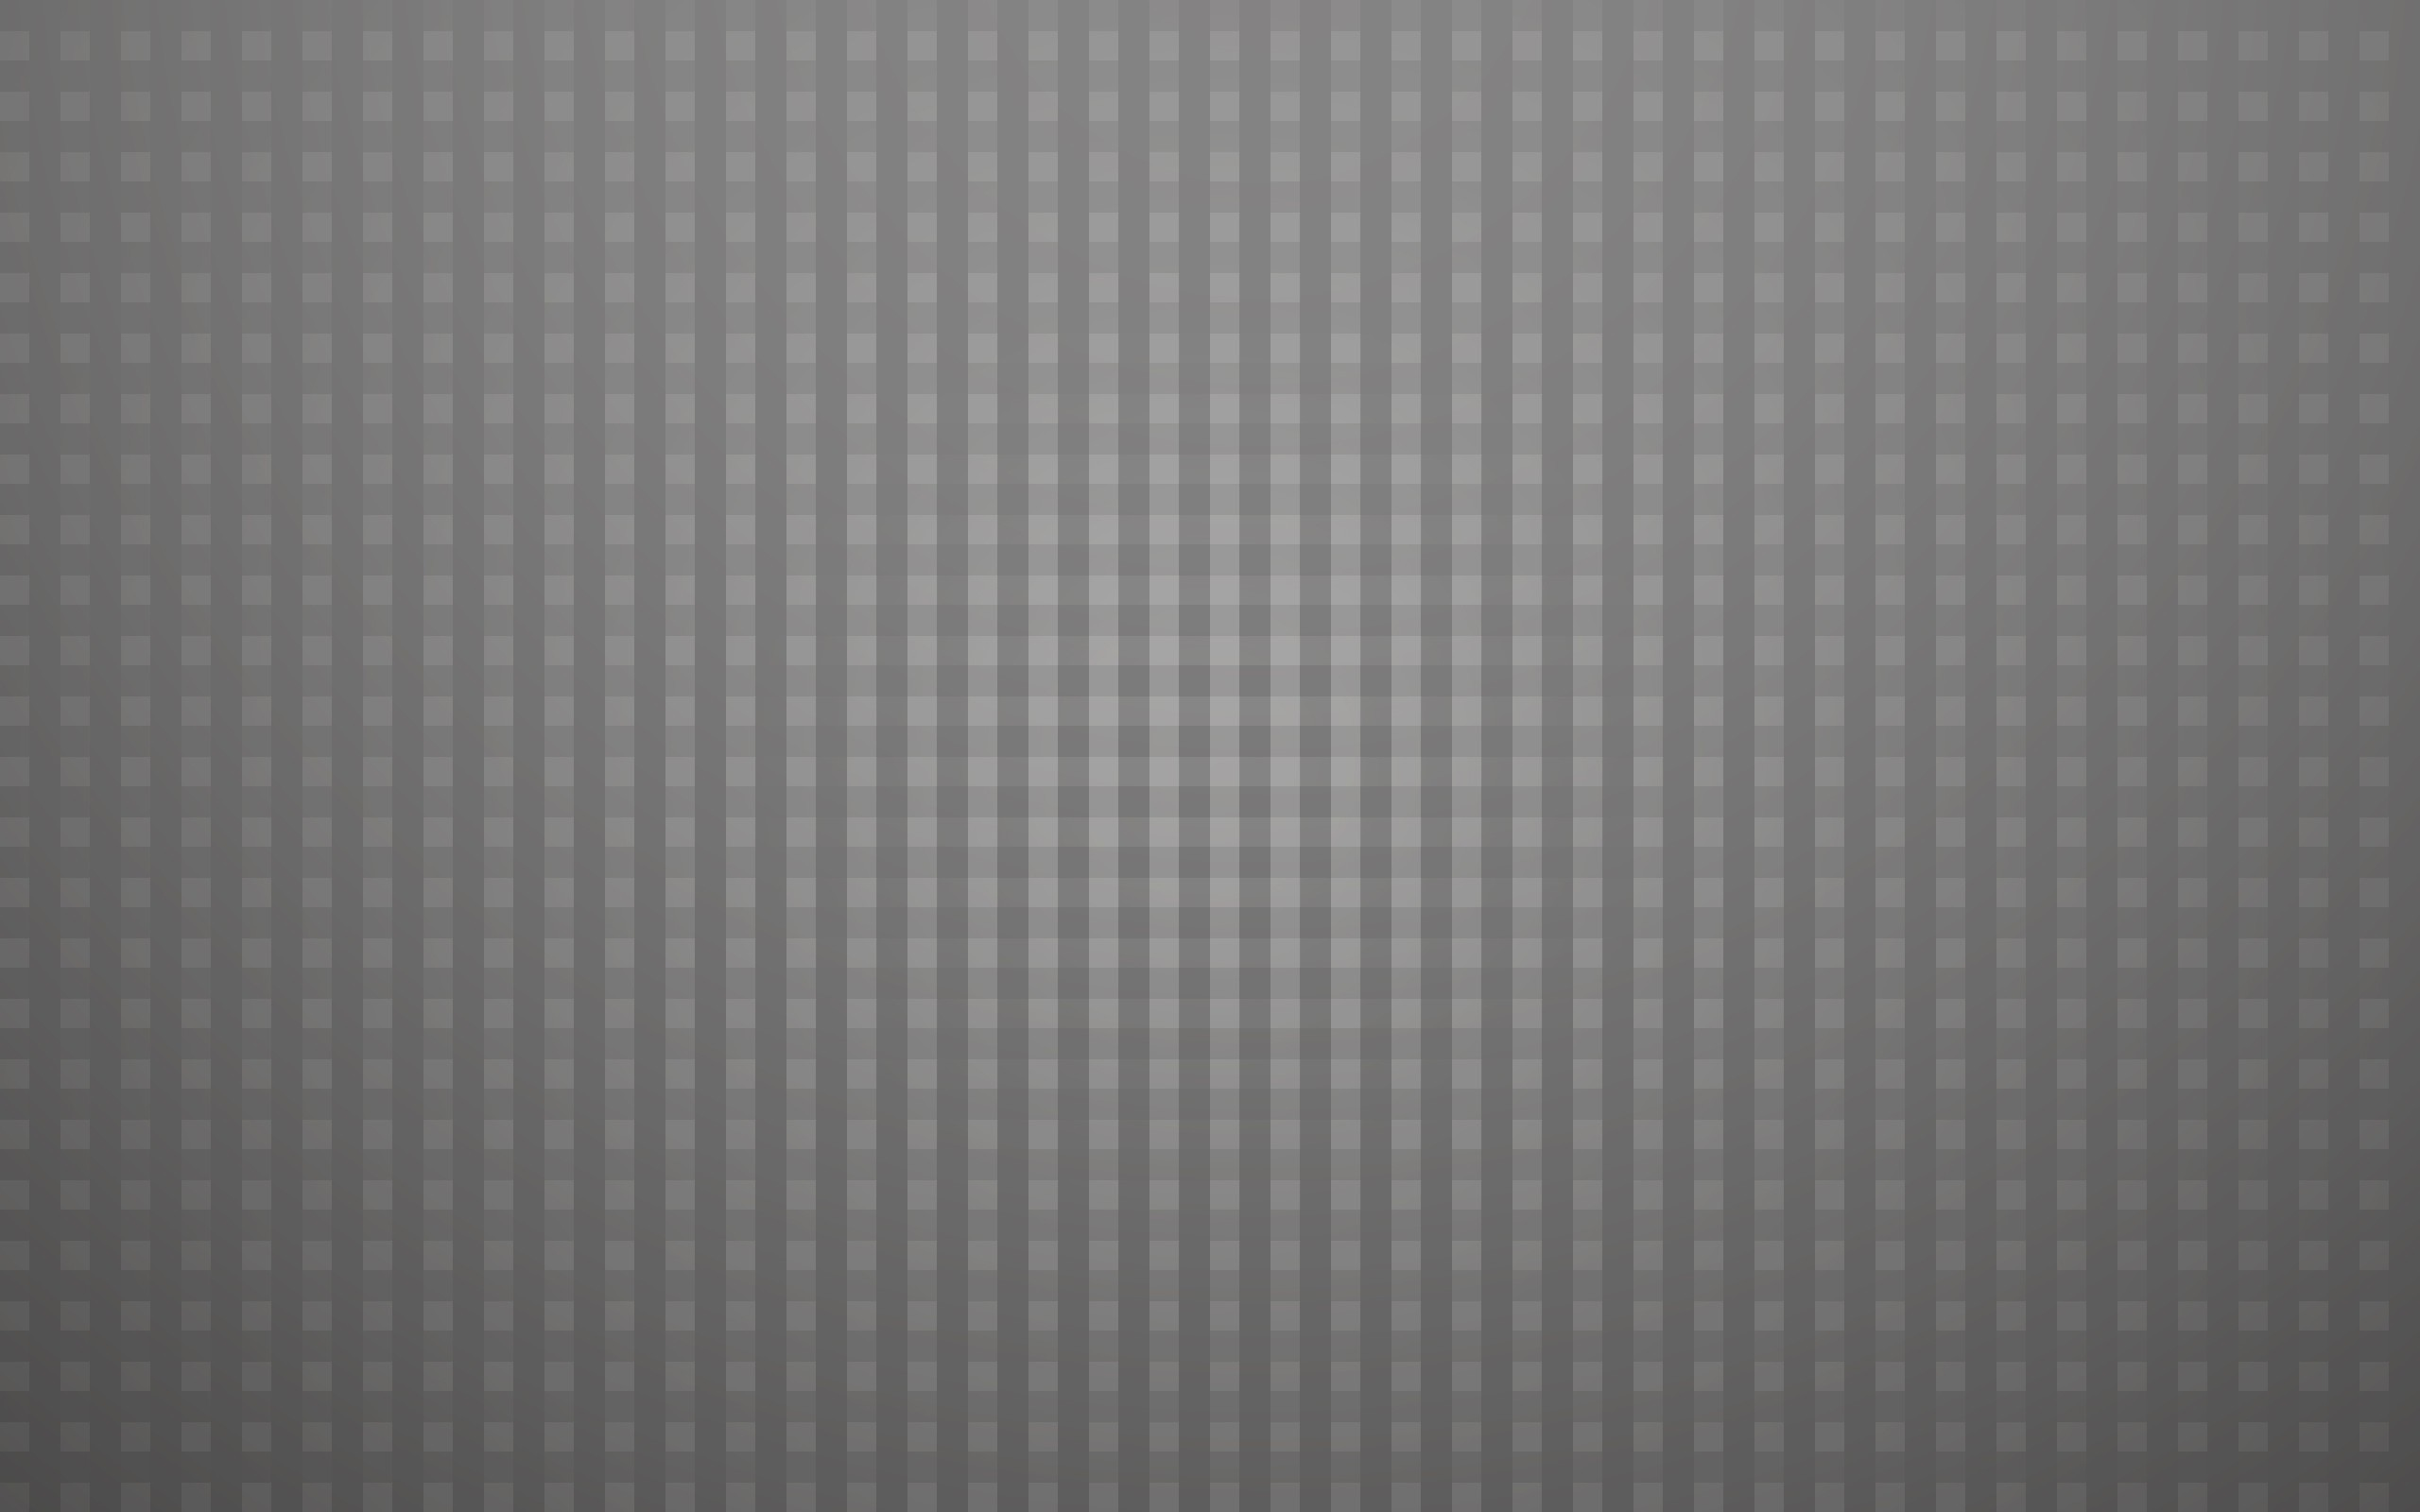 Wallpaper Grid, Faded, Texture, Surface, Shape, Line, Symmetry